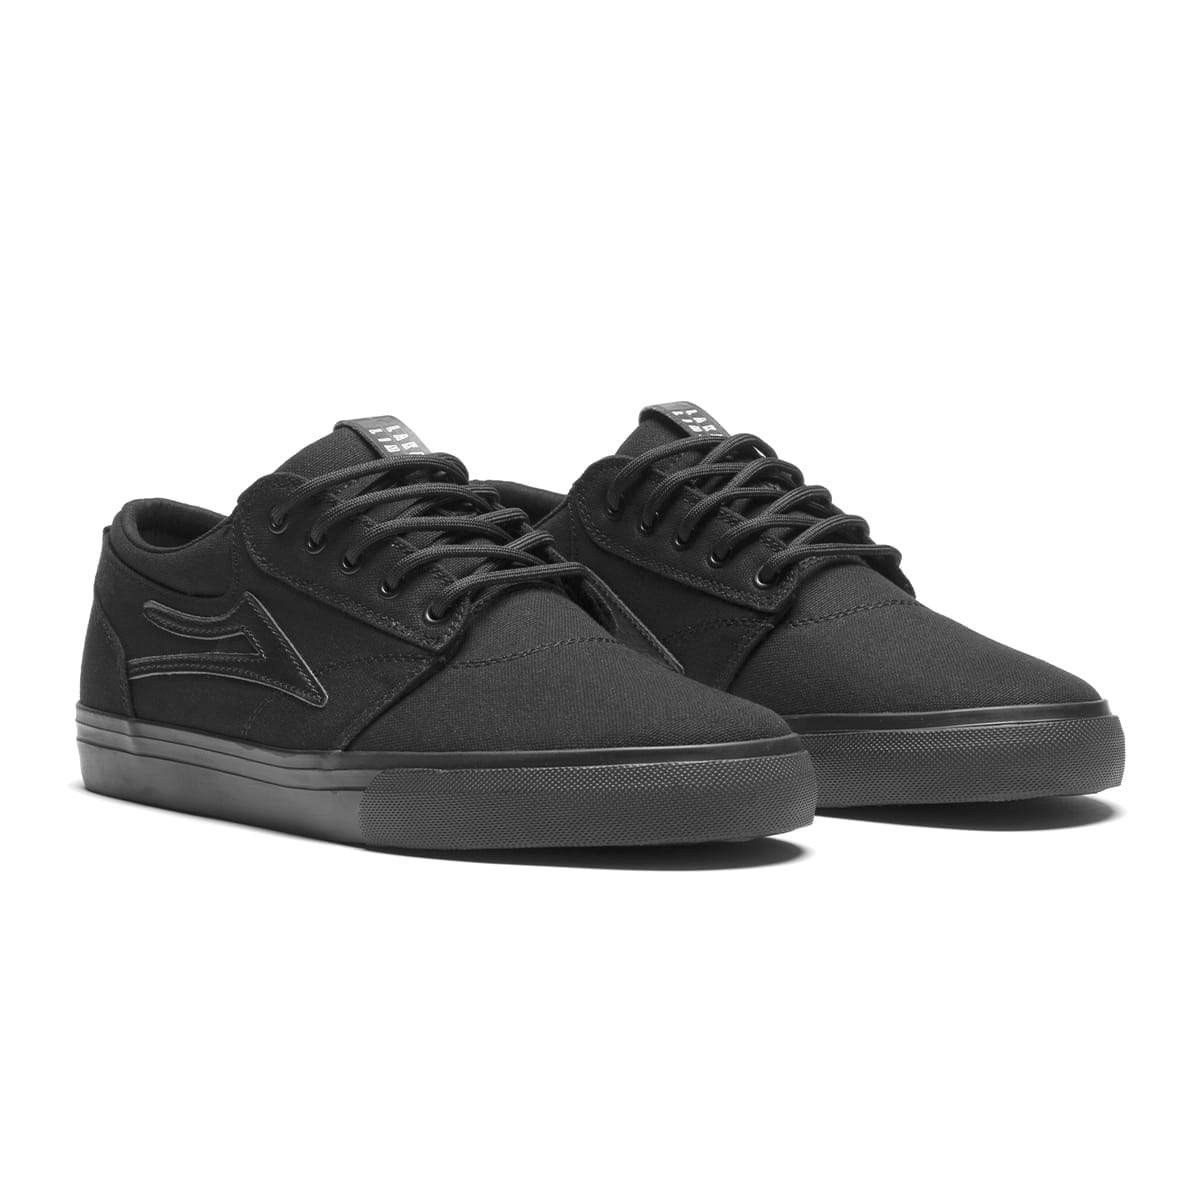 Lakai Griffin - Black/Black Canvas